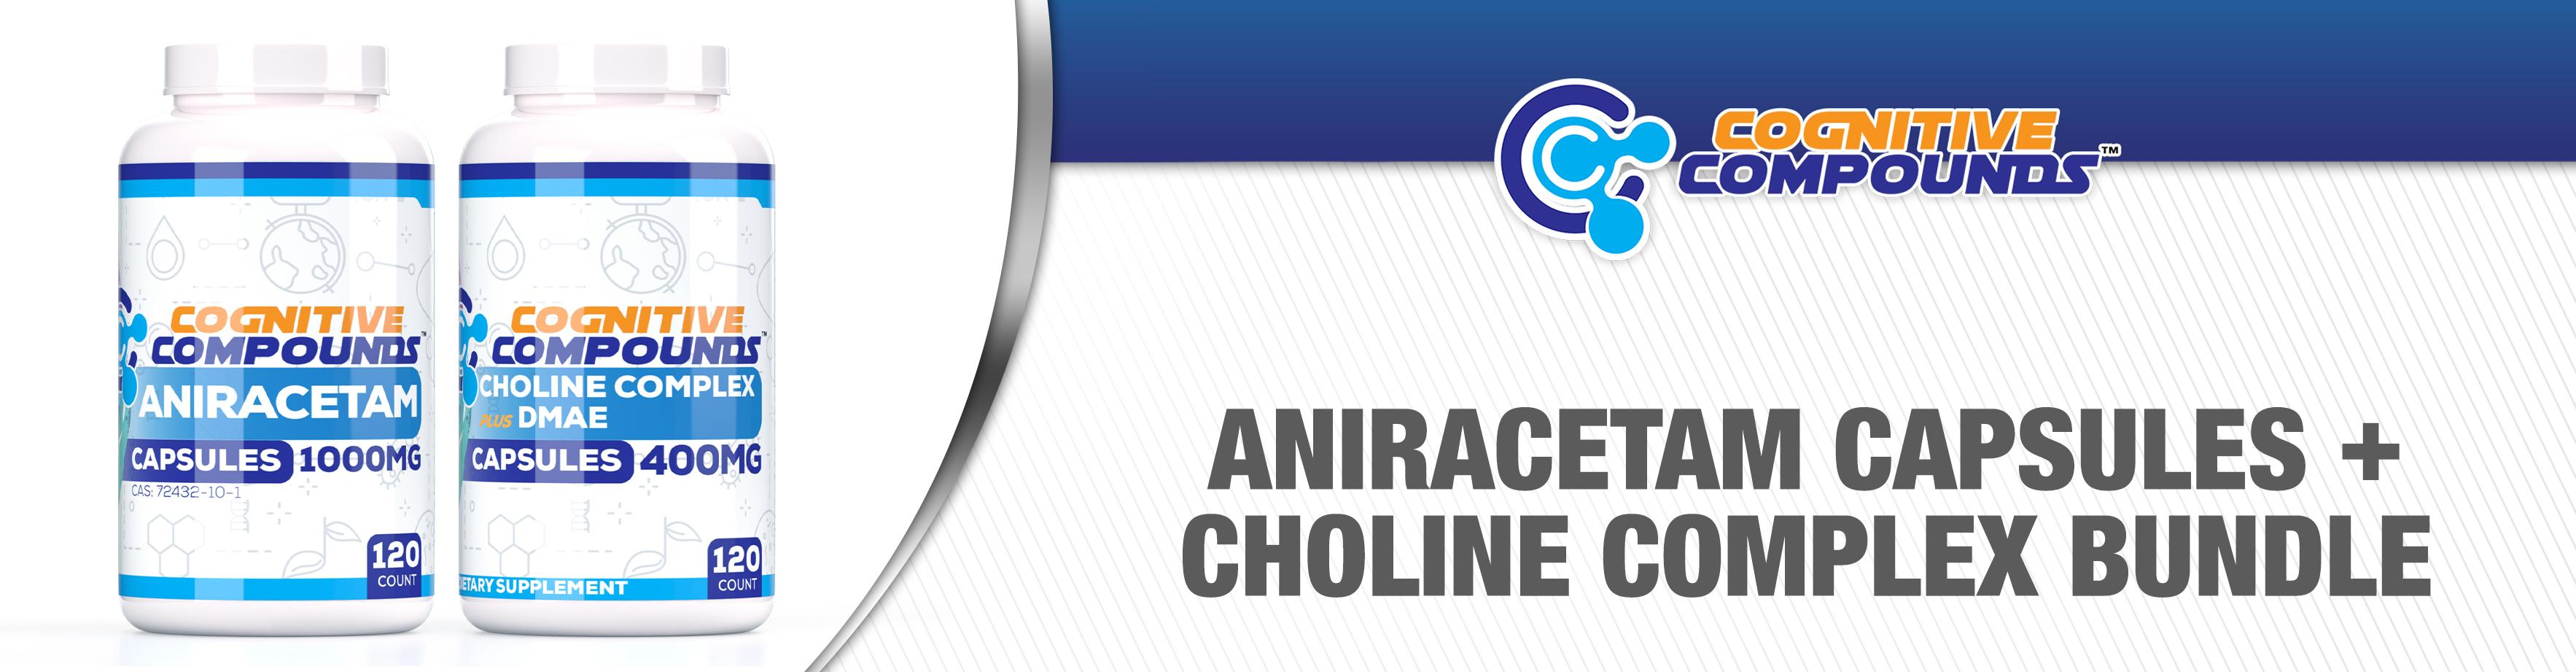 aniracetam-capsules-choline-complex-bundle.jpg